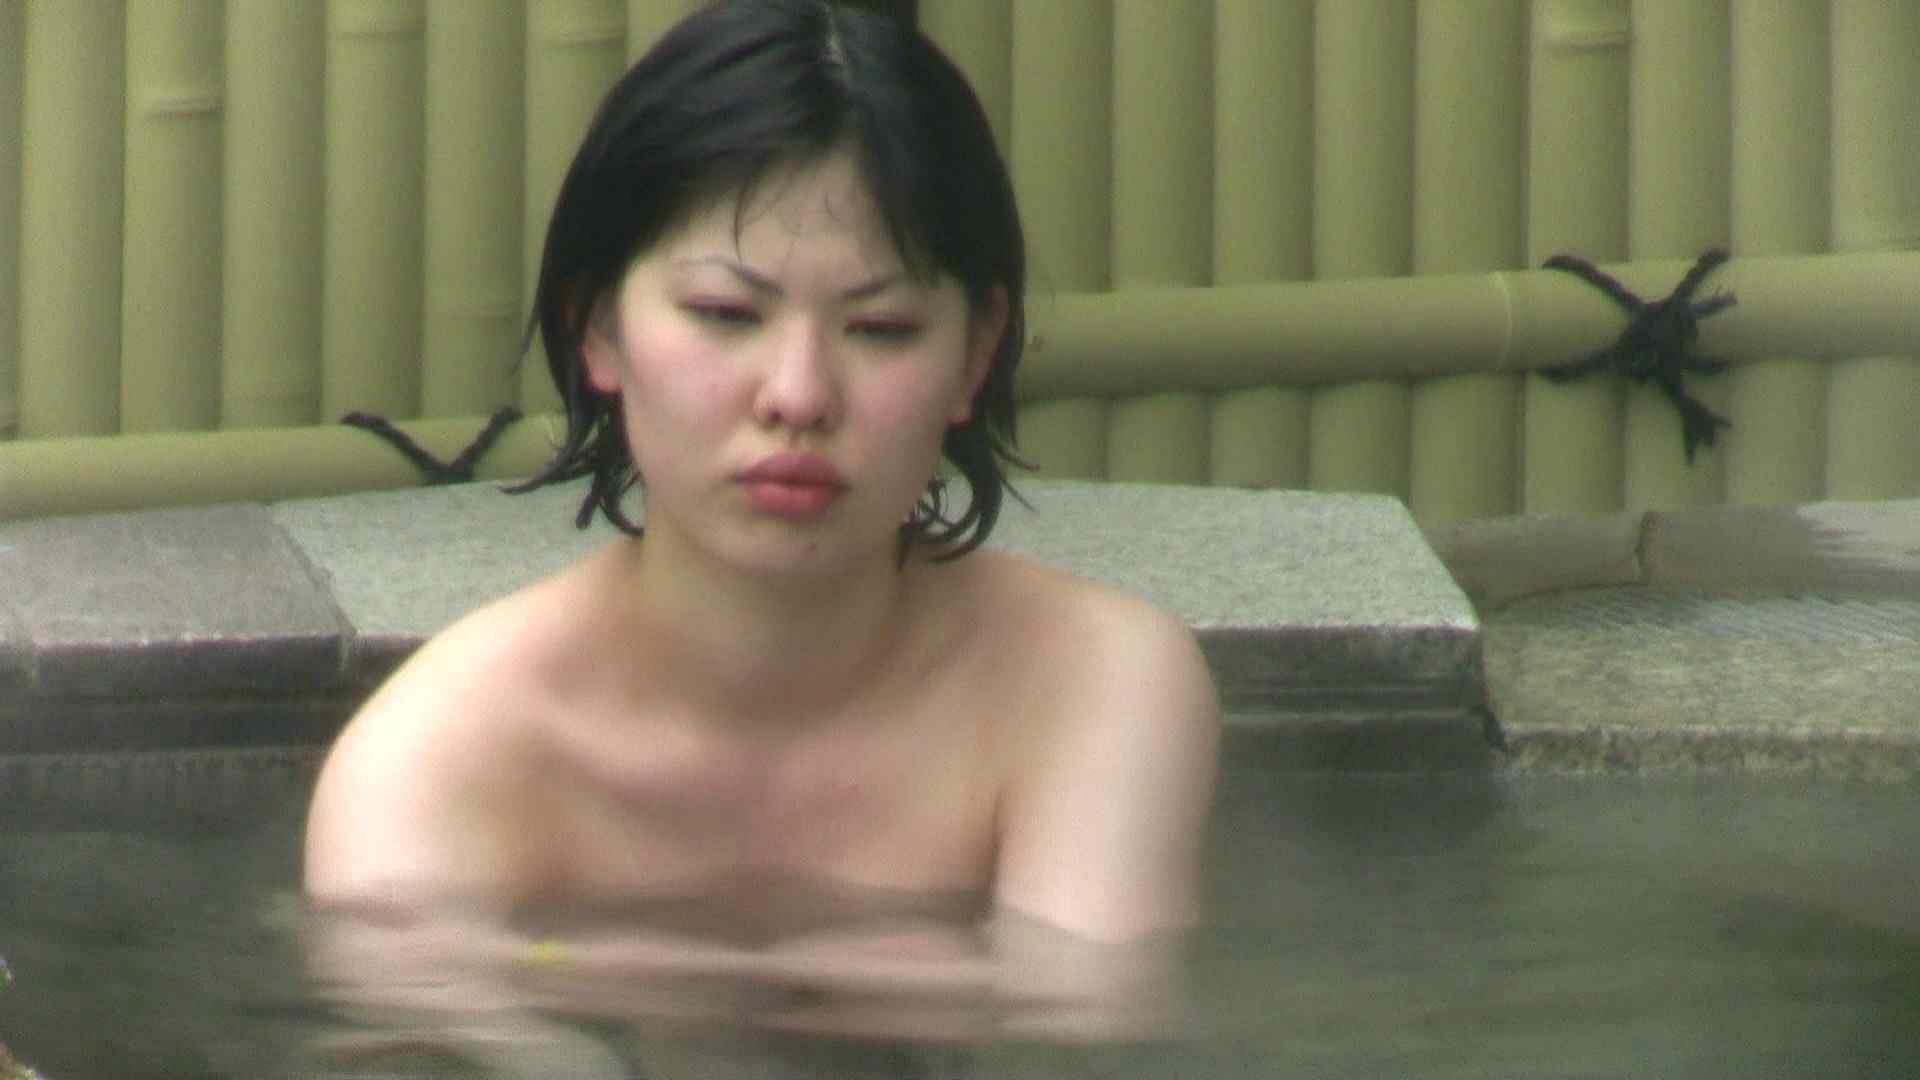 Aquaな露天風呂Vol.114 盗撮映像  72Pix 23